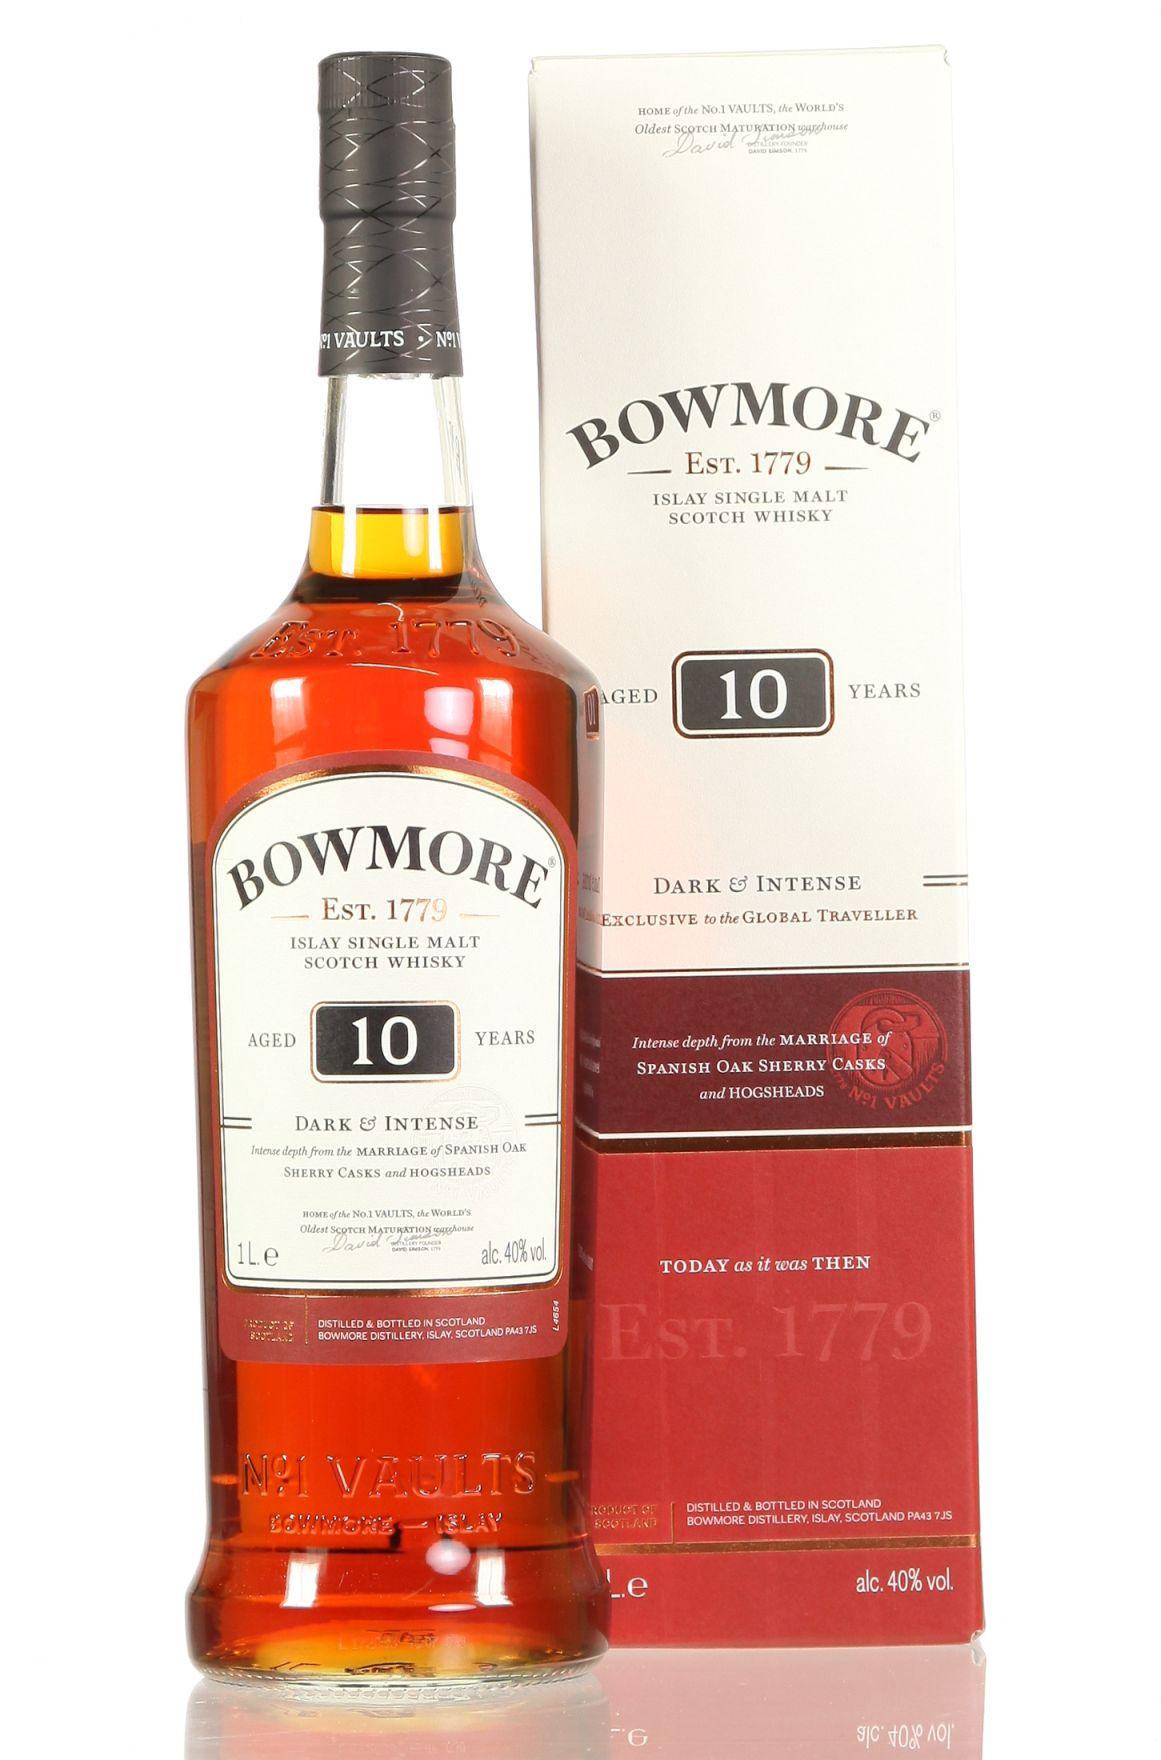 Bowmore 40% Dark & Intense